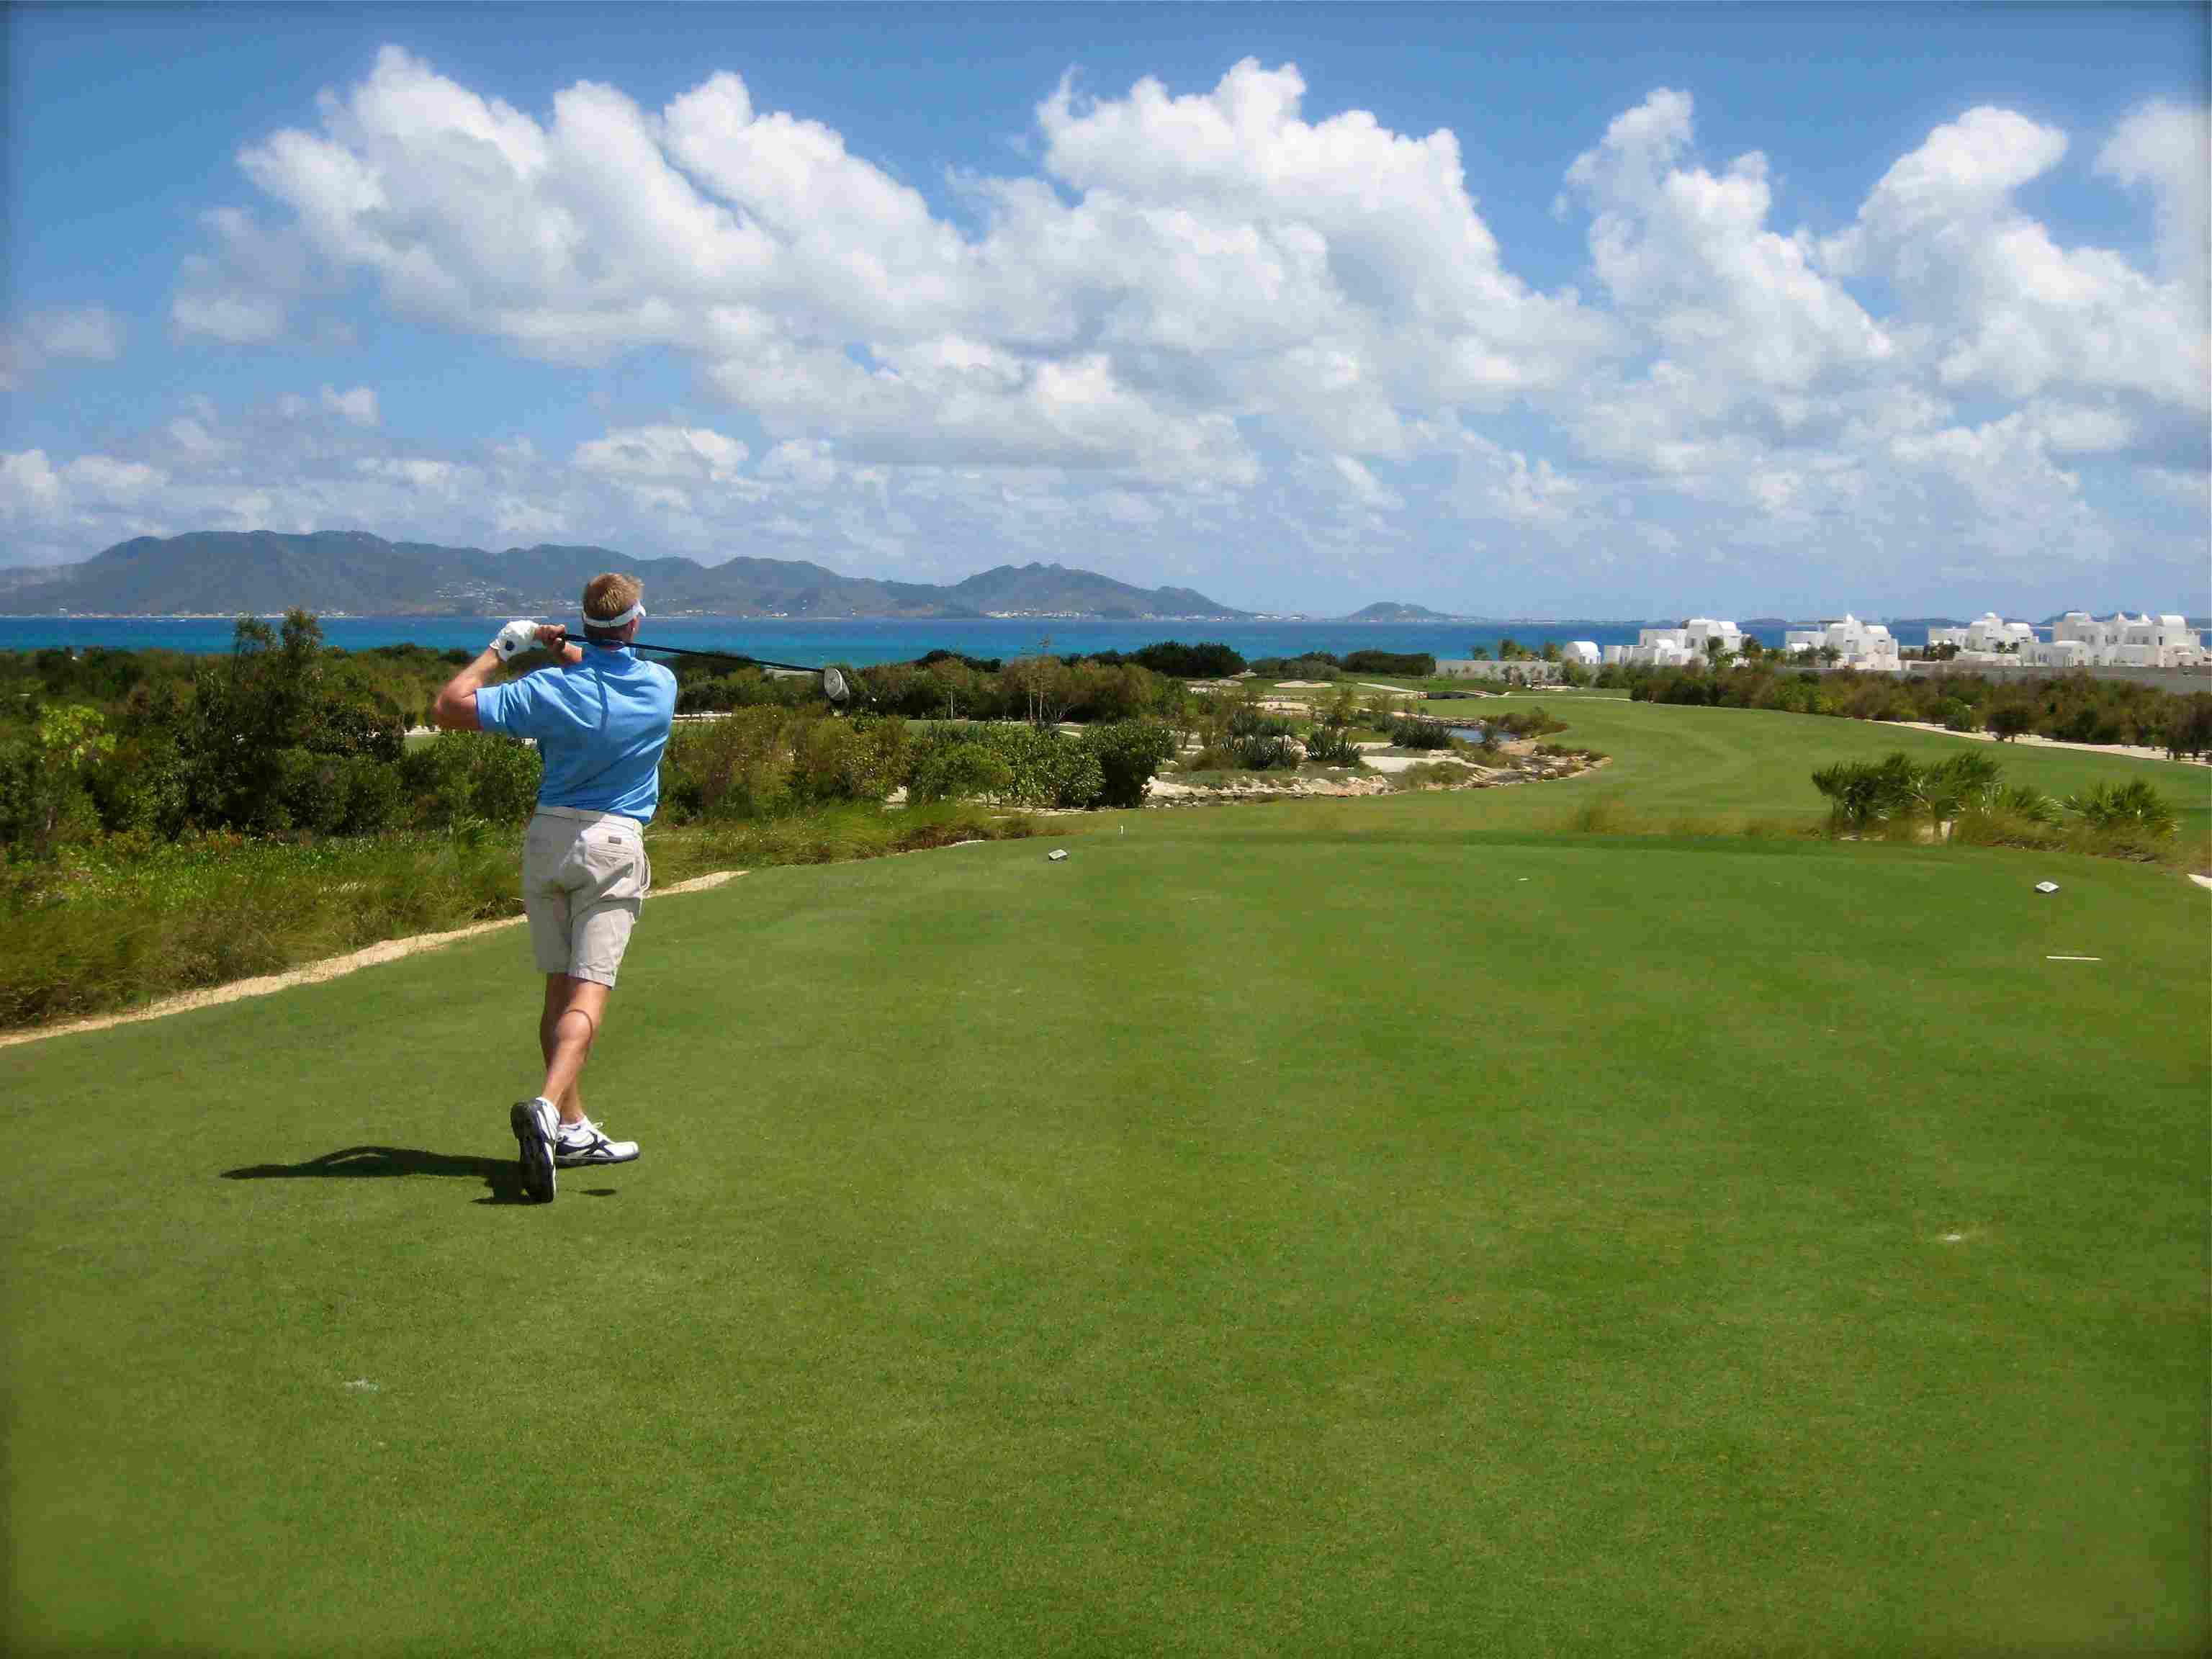 Golfer swinging at the CuisinArt Golf Resort & Spa in Anguilla